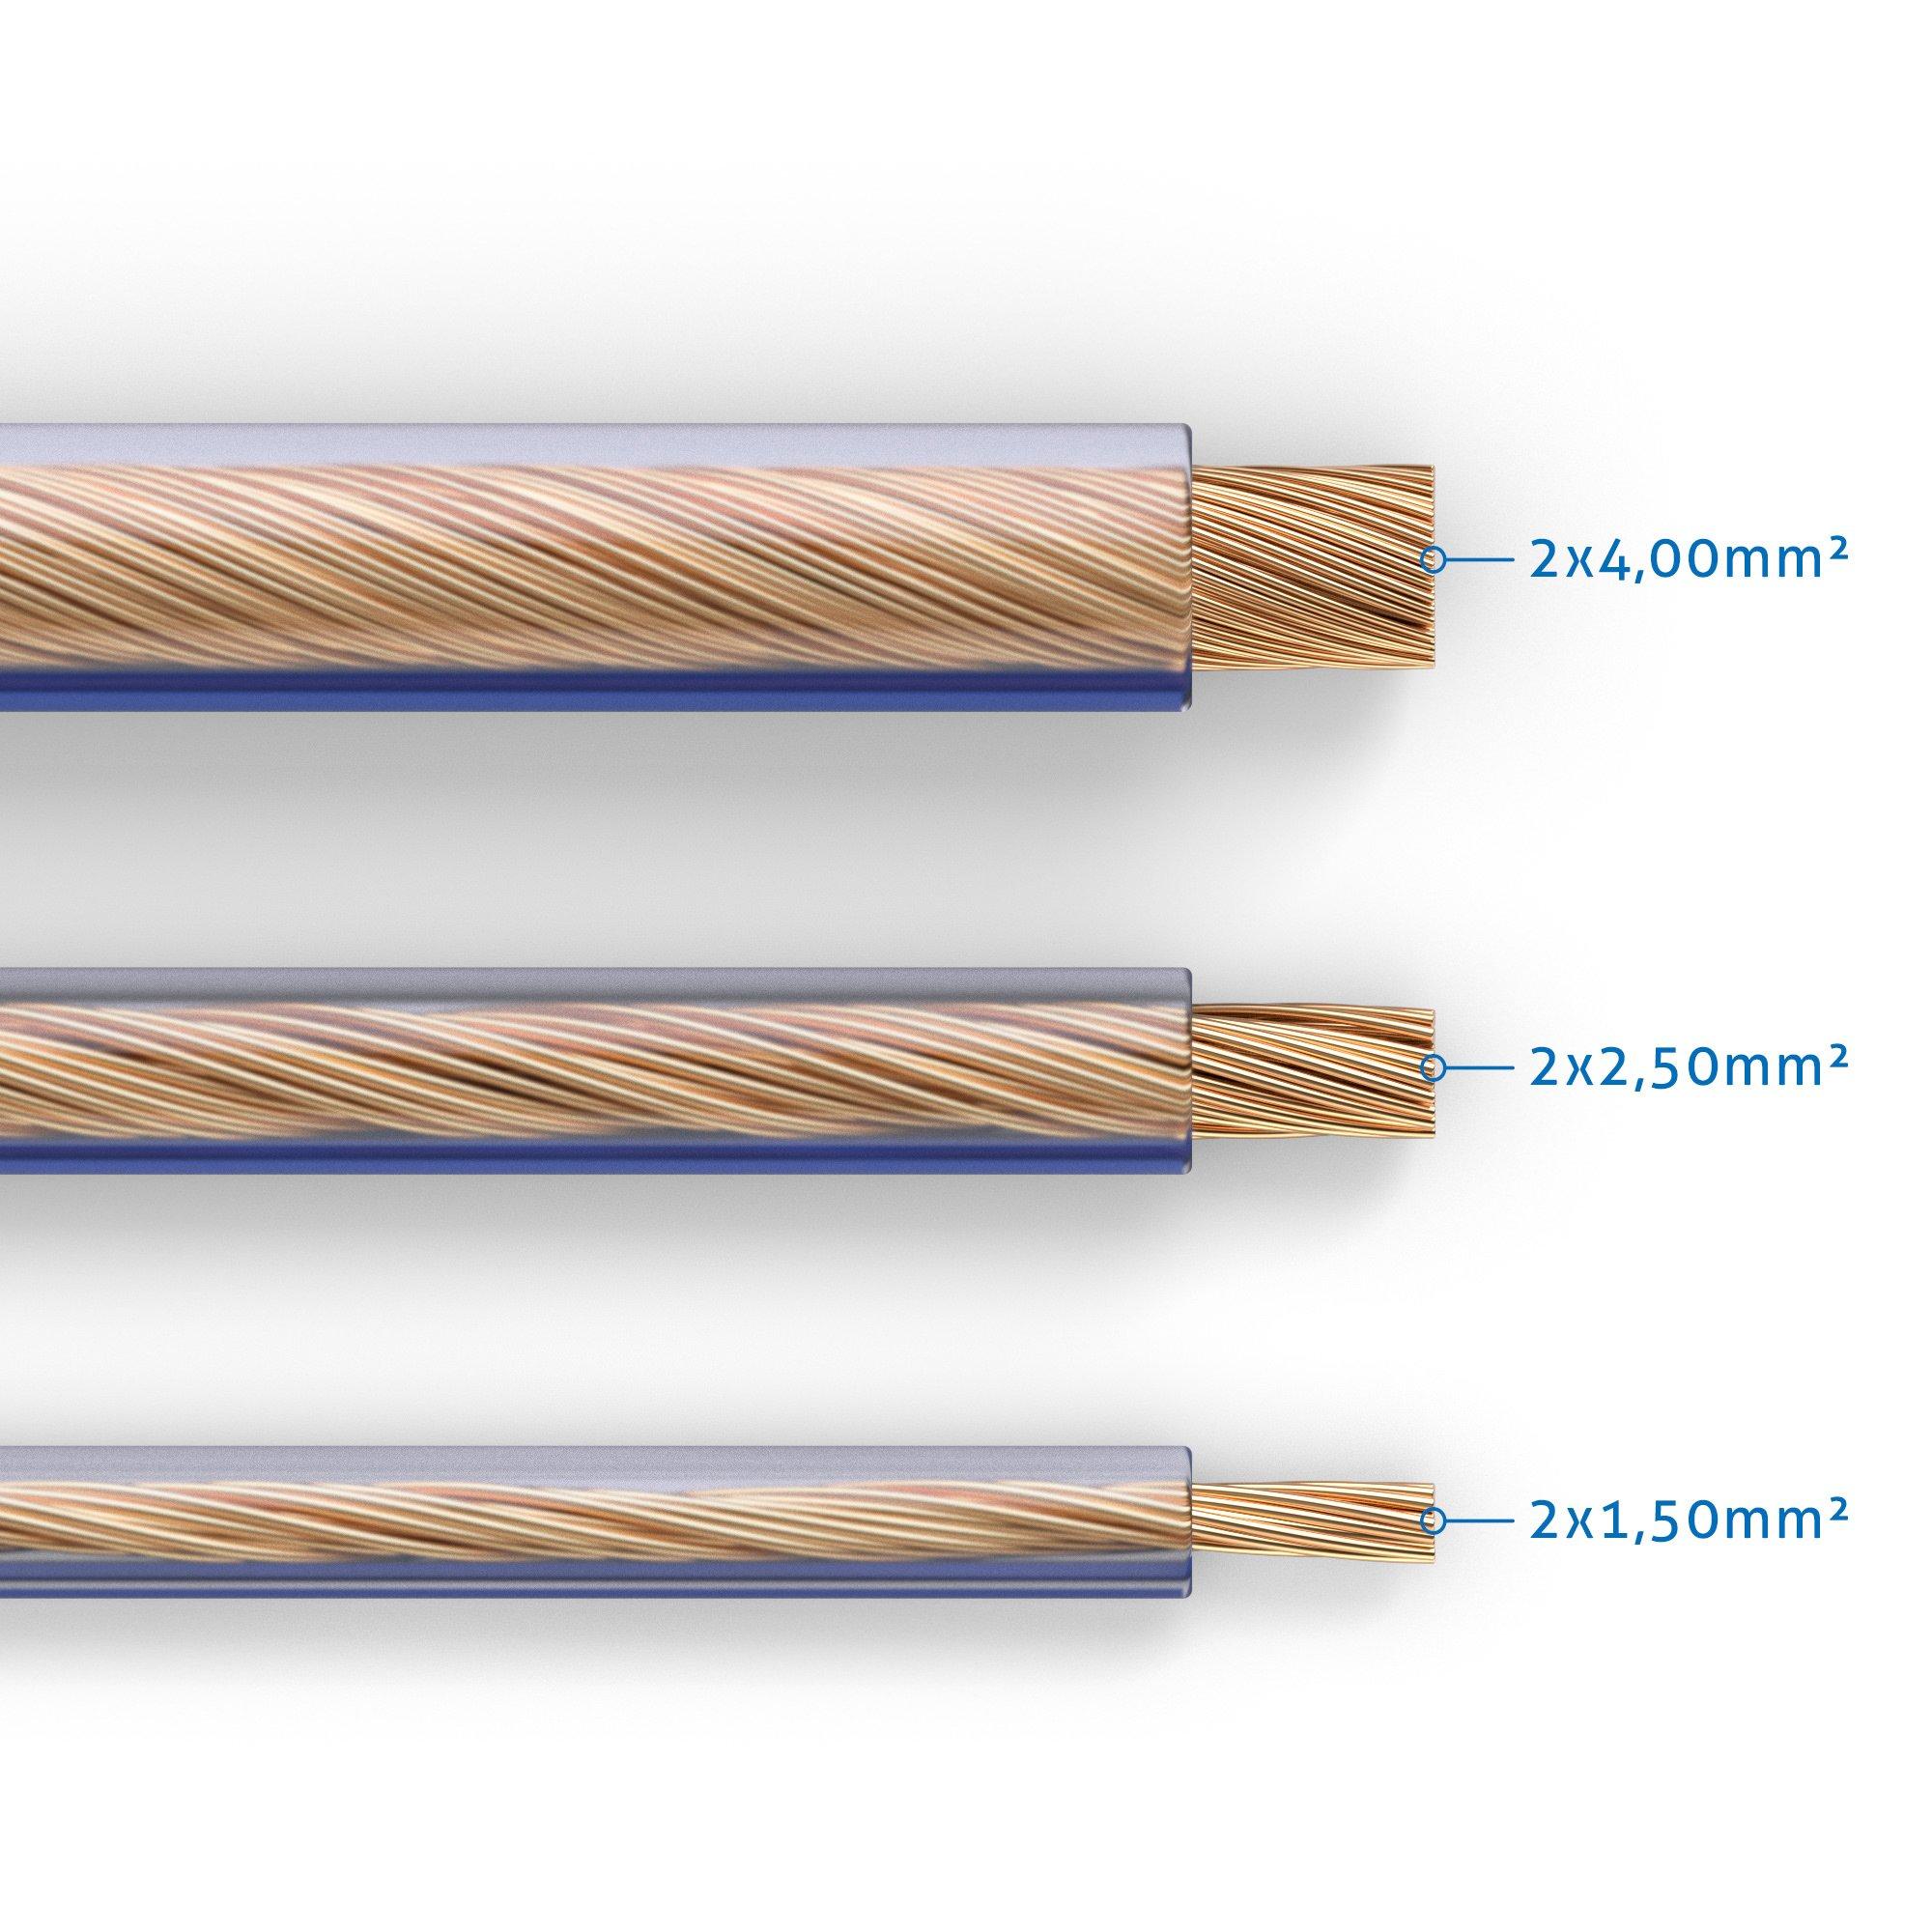 Hifi Boxenkabel PureLink SP020-025 Lautsprecherkabel 2 x 4,0mm/² transparent 25m 99,9/% OFC Vollkupfer 0,10mm Litze